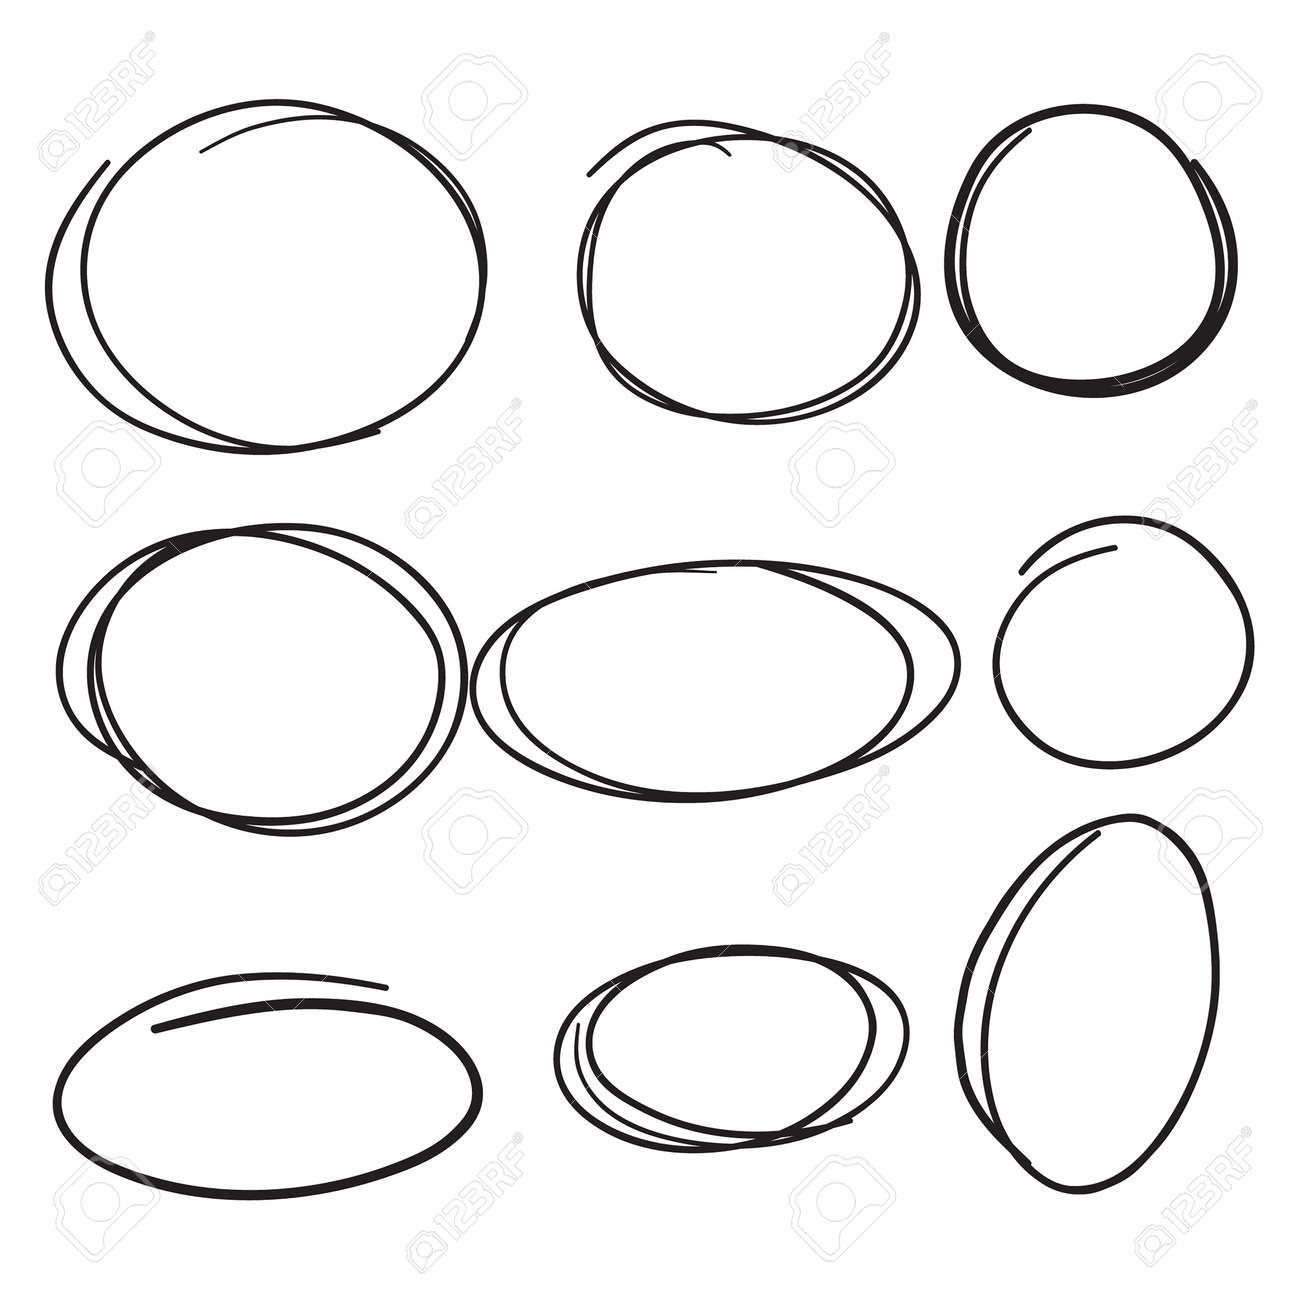 Set hand drawn ovals. - 172796448